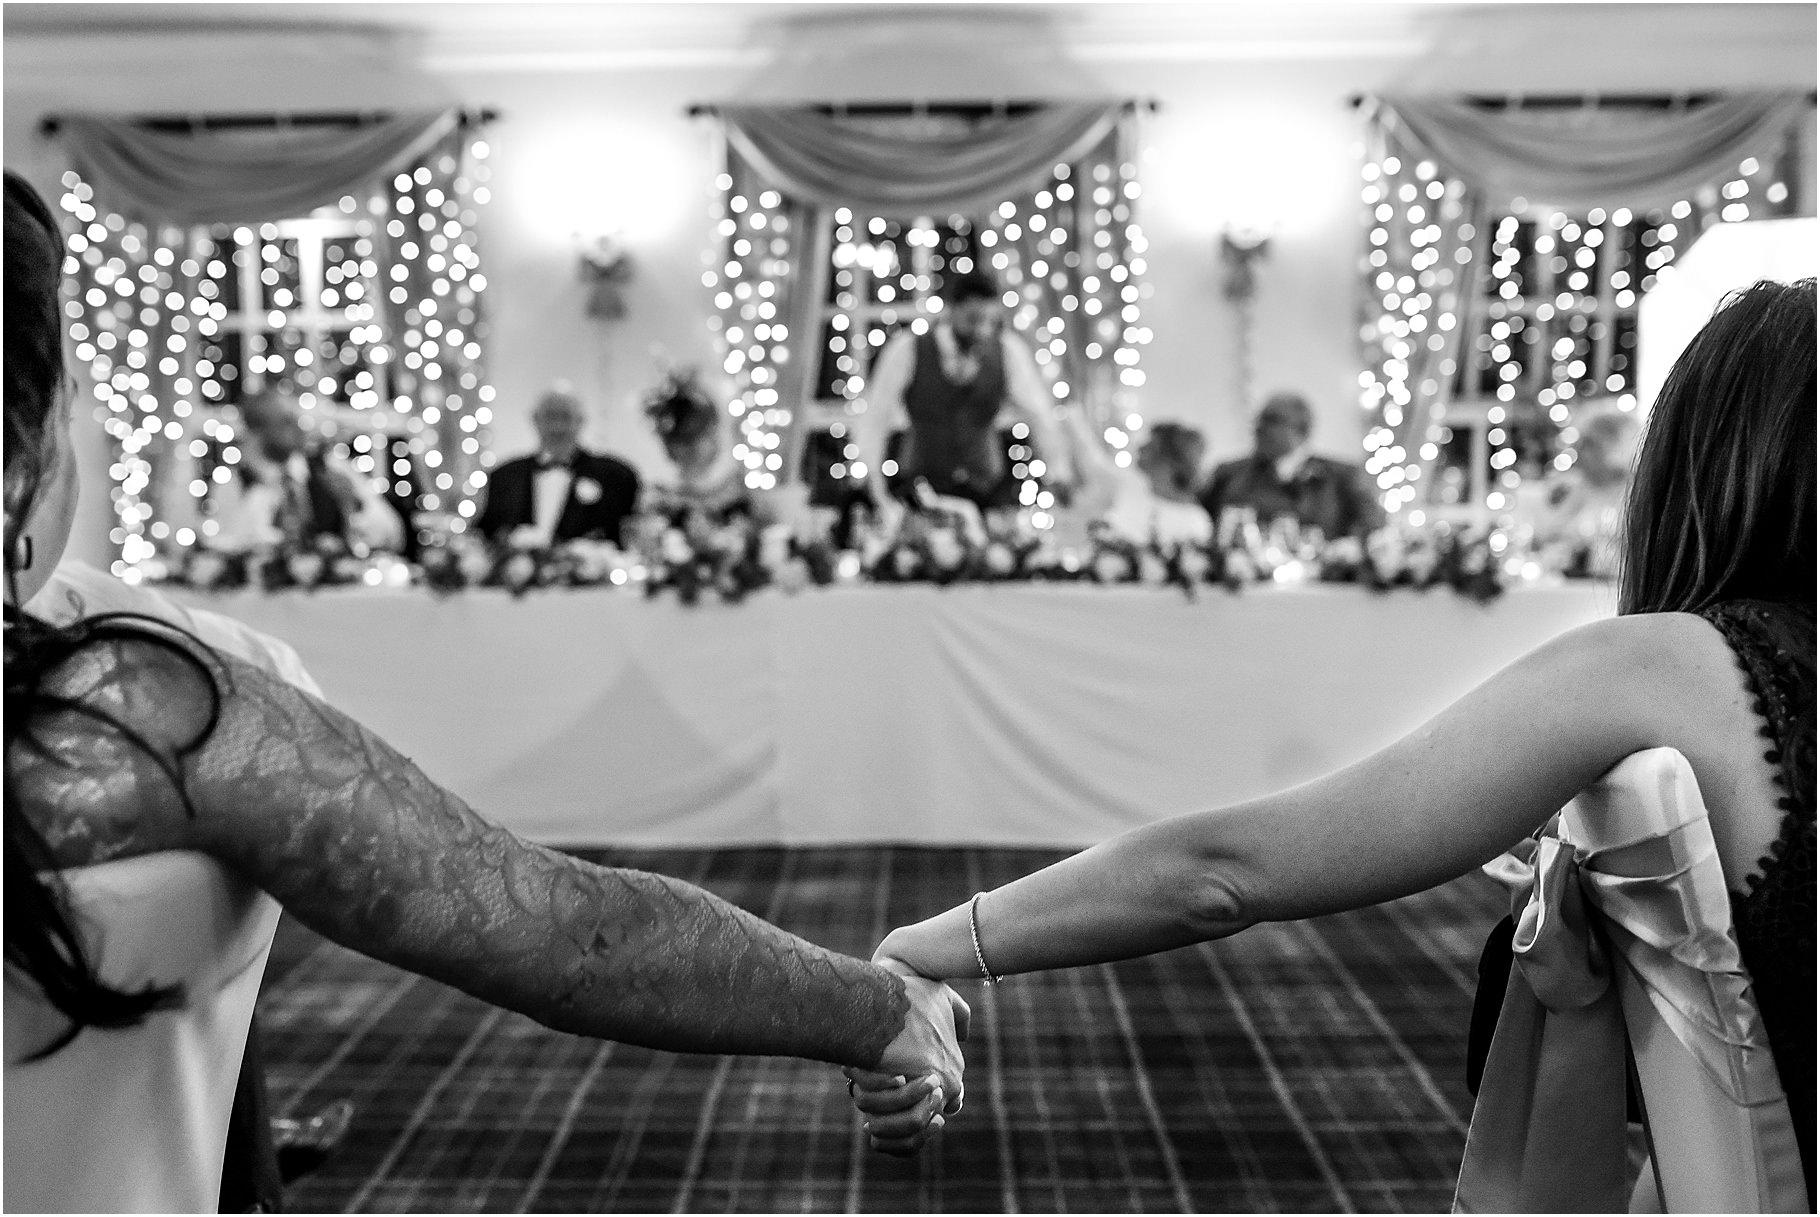 dan-wootton-photography-2017-weddings-074.jpg